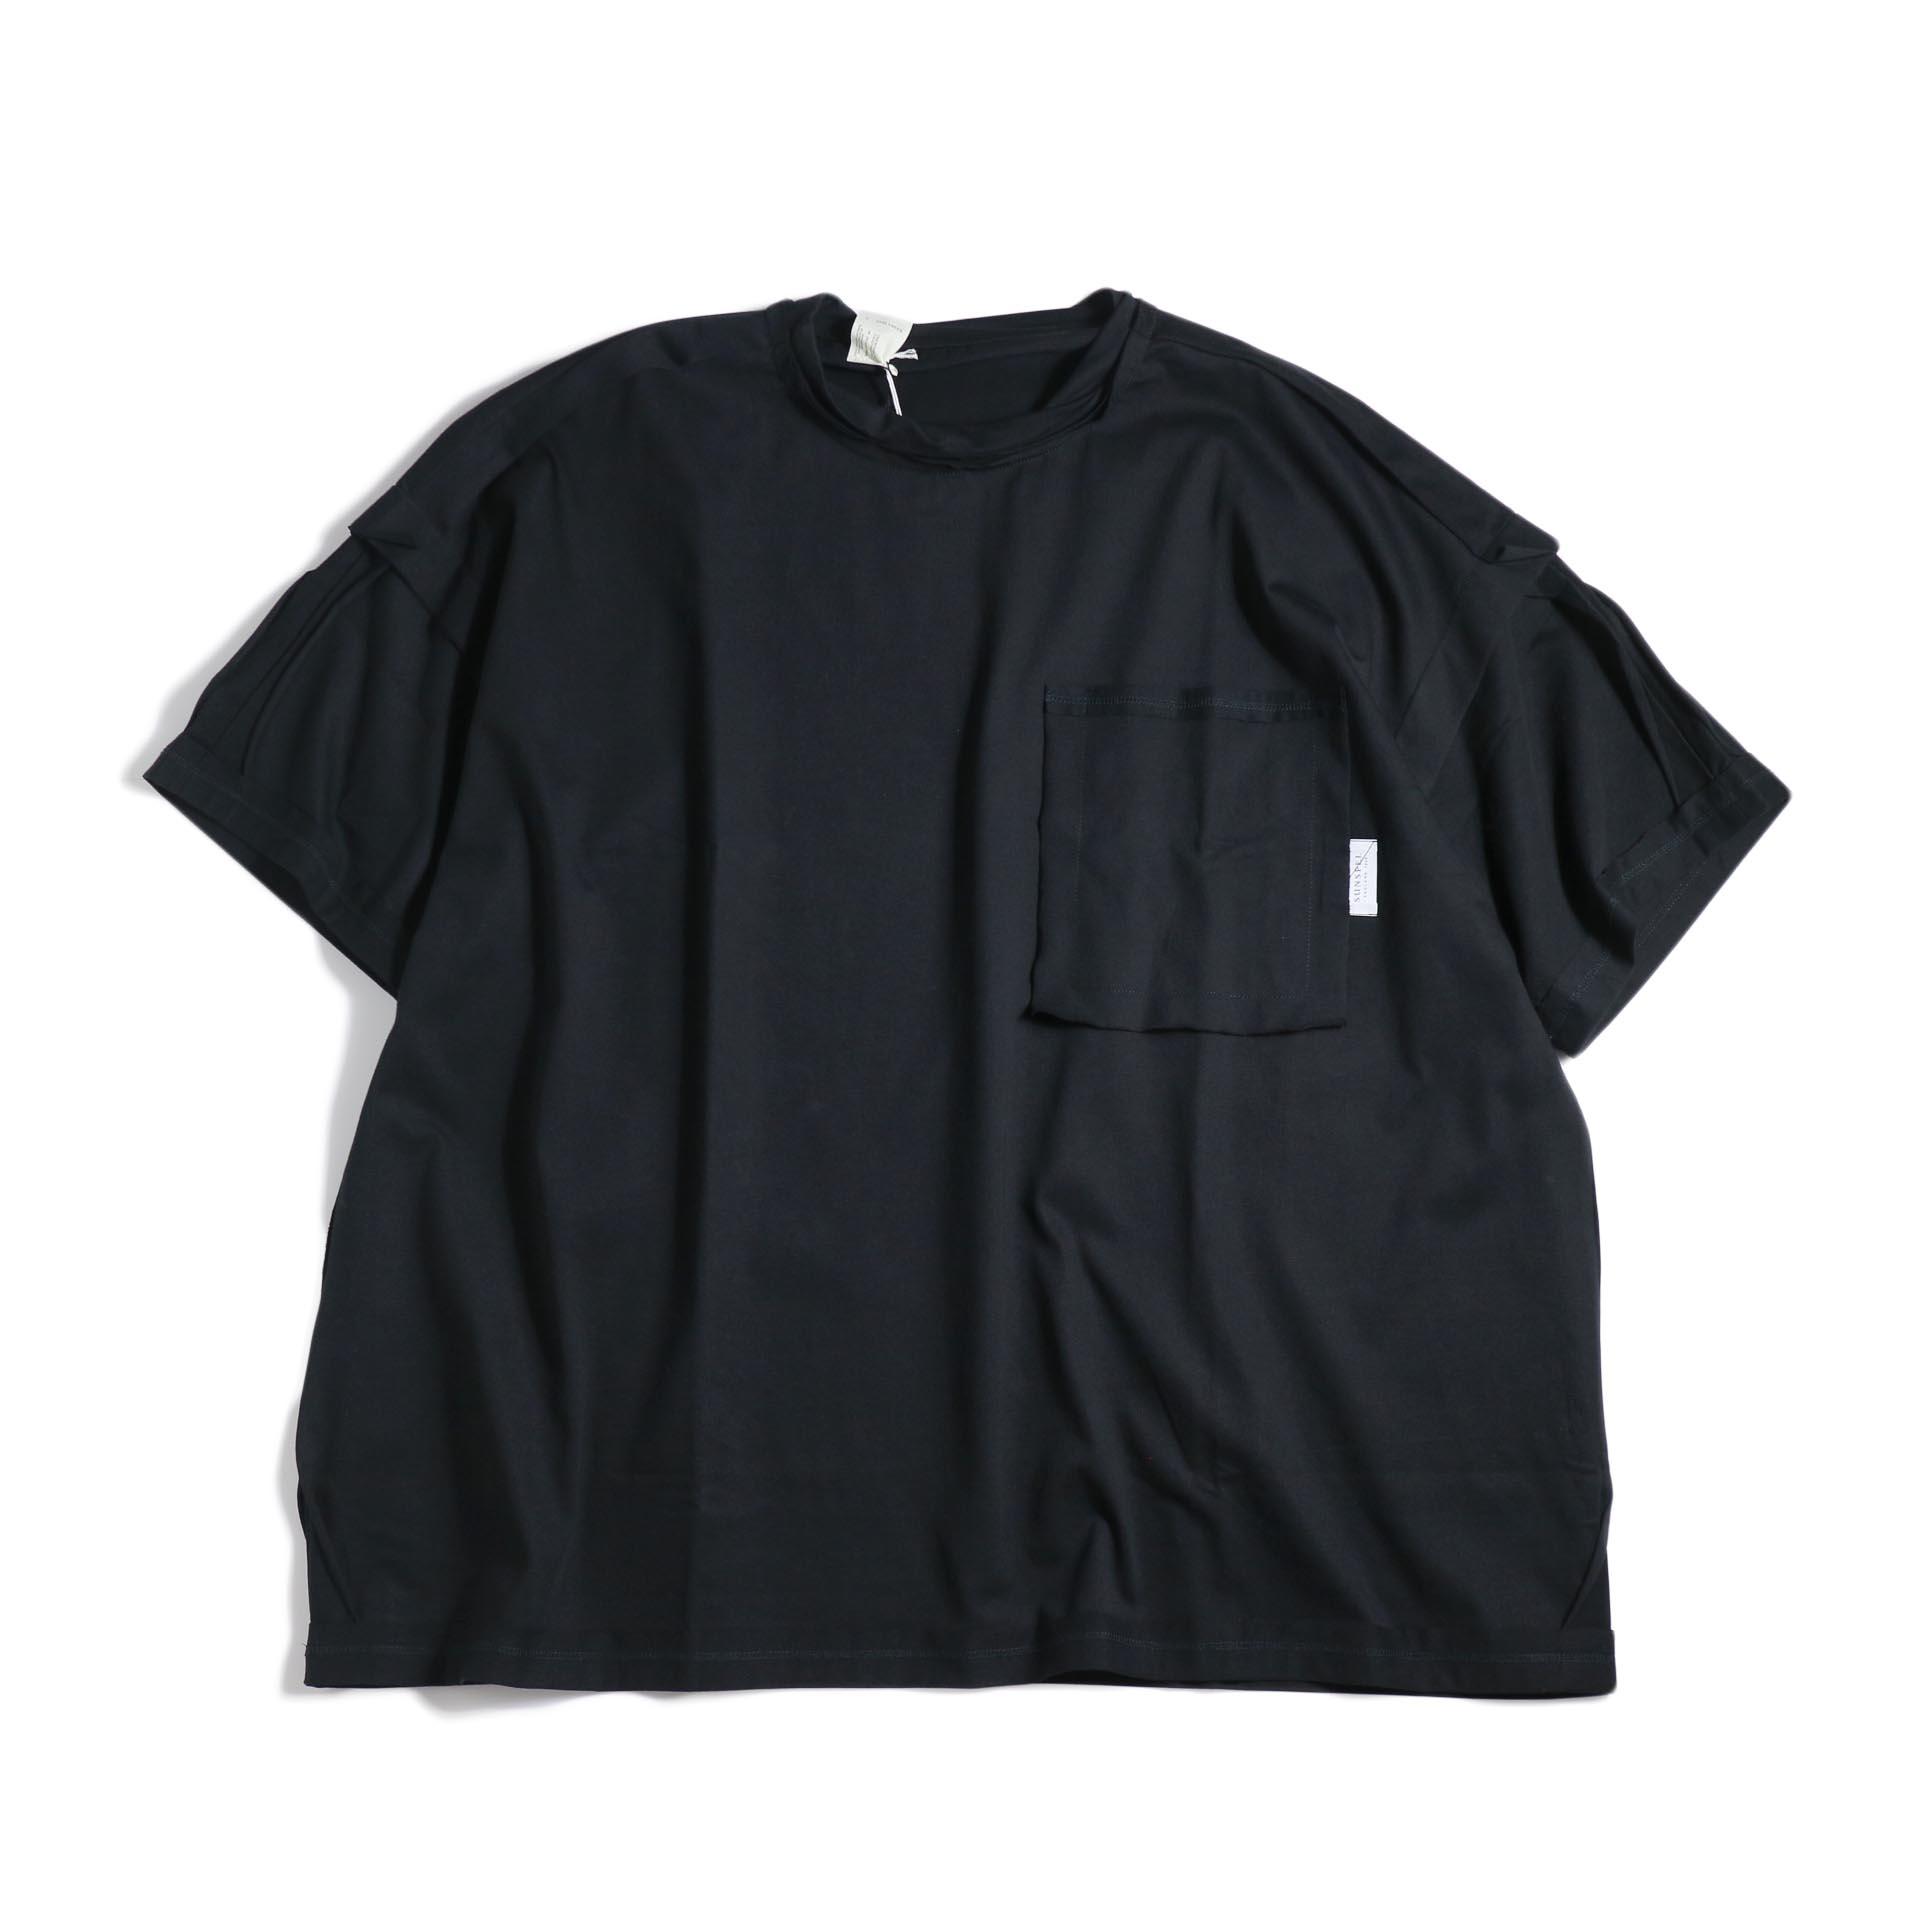 N.HOOLYWOOD×SUNSPEL / 1201-CS61-024 Short Sleeve Shirt (Black)